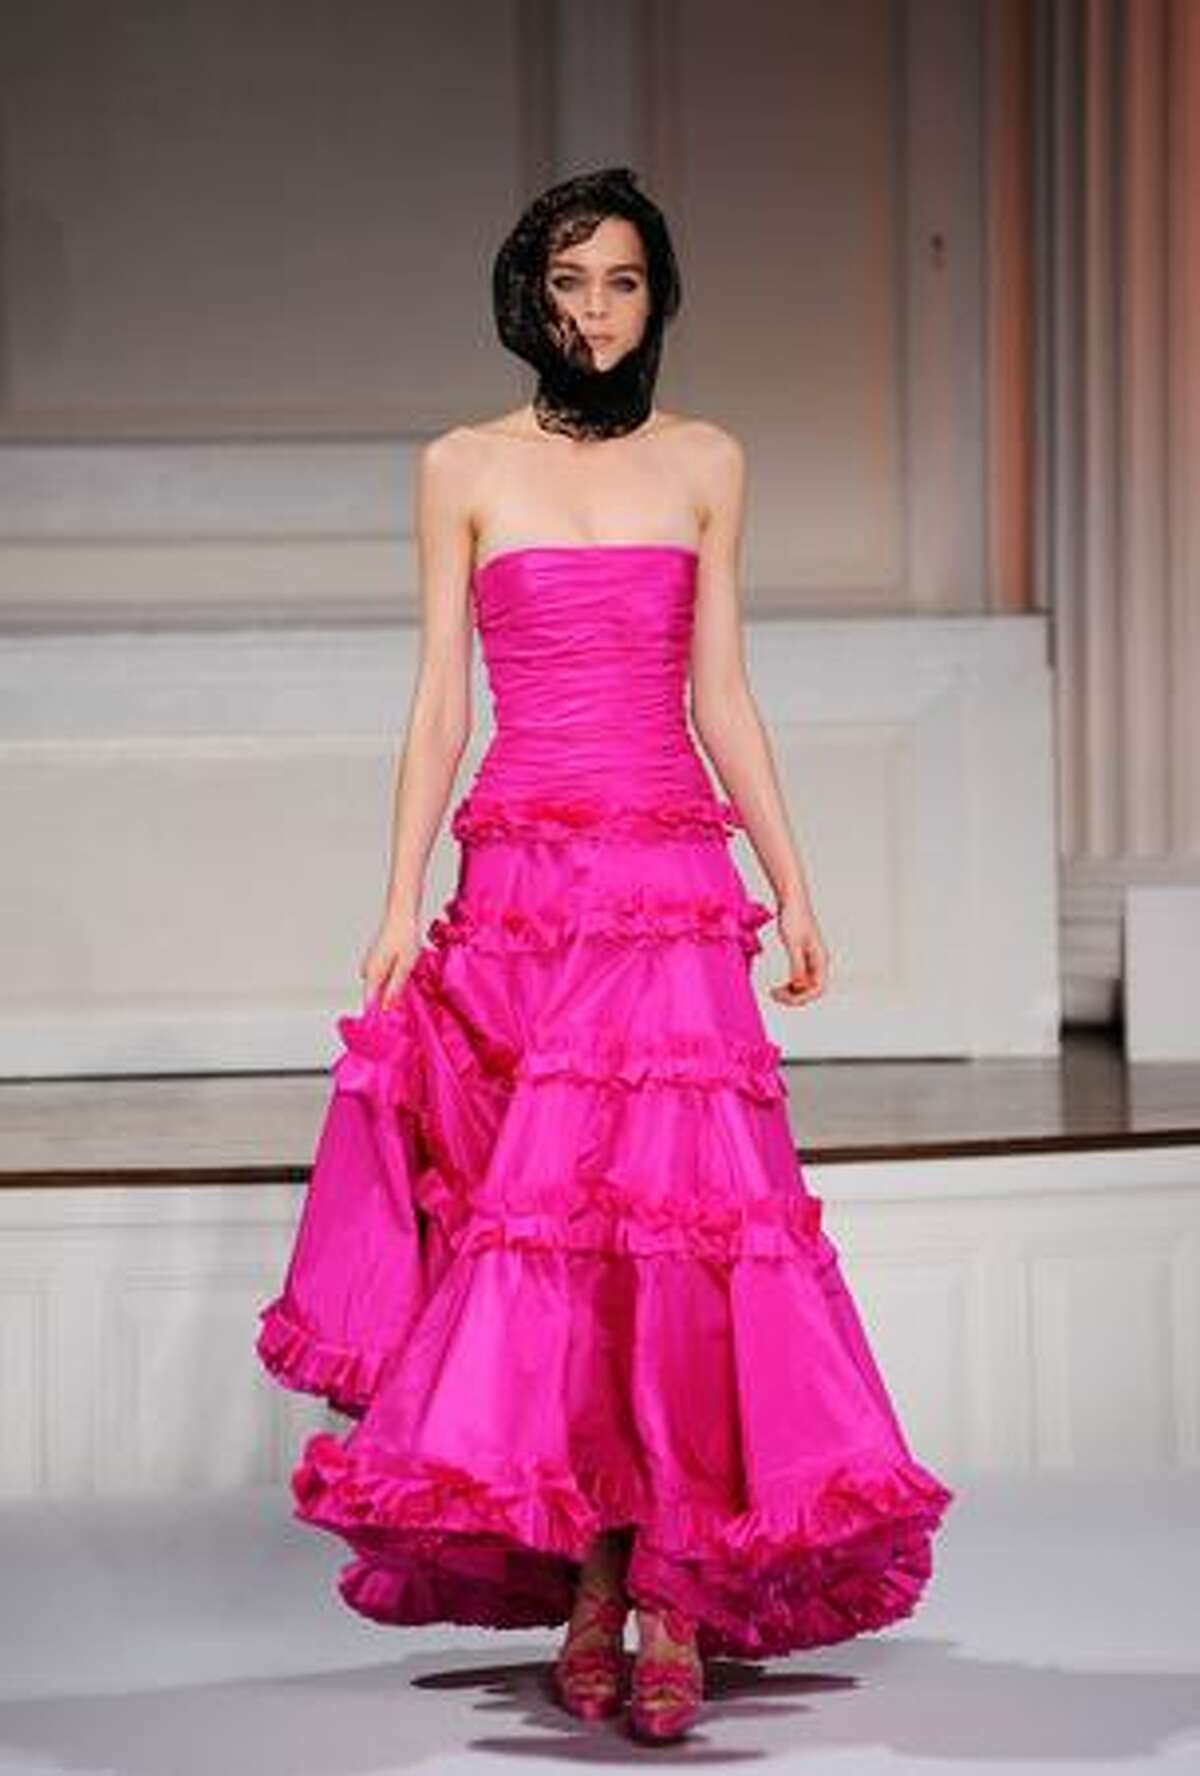 A model walks the runway at Oscar De La Renta Spring 2010 fashion show at 583 Park Avenue in New York City.